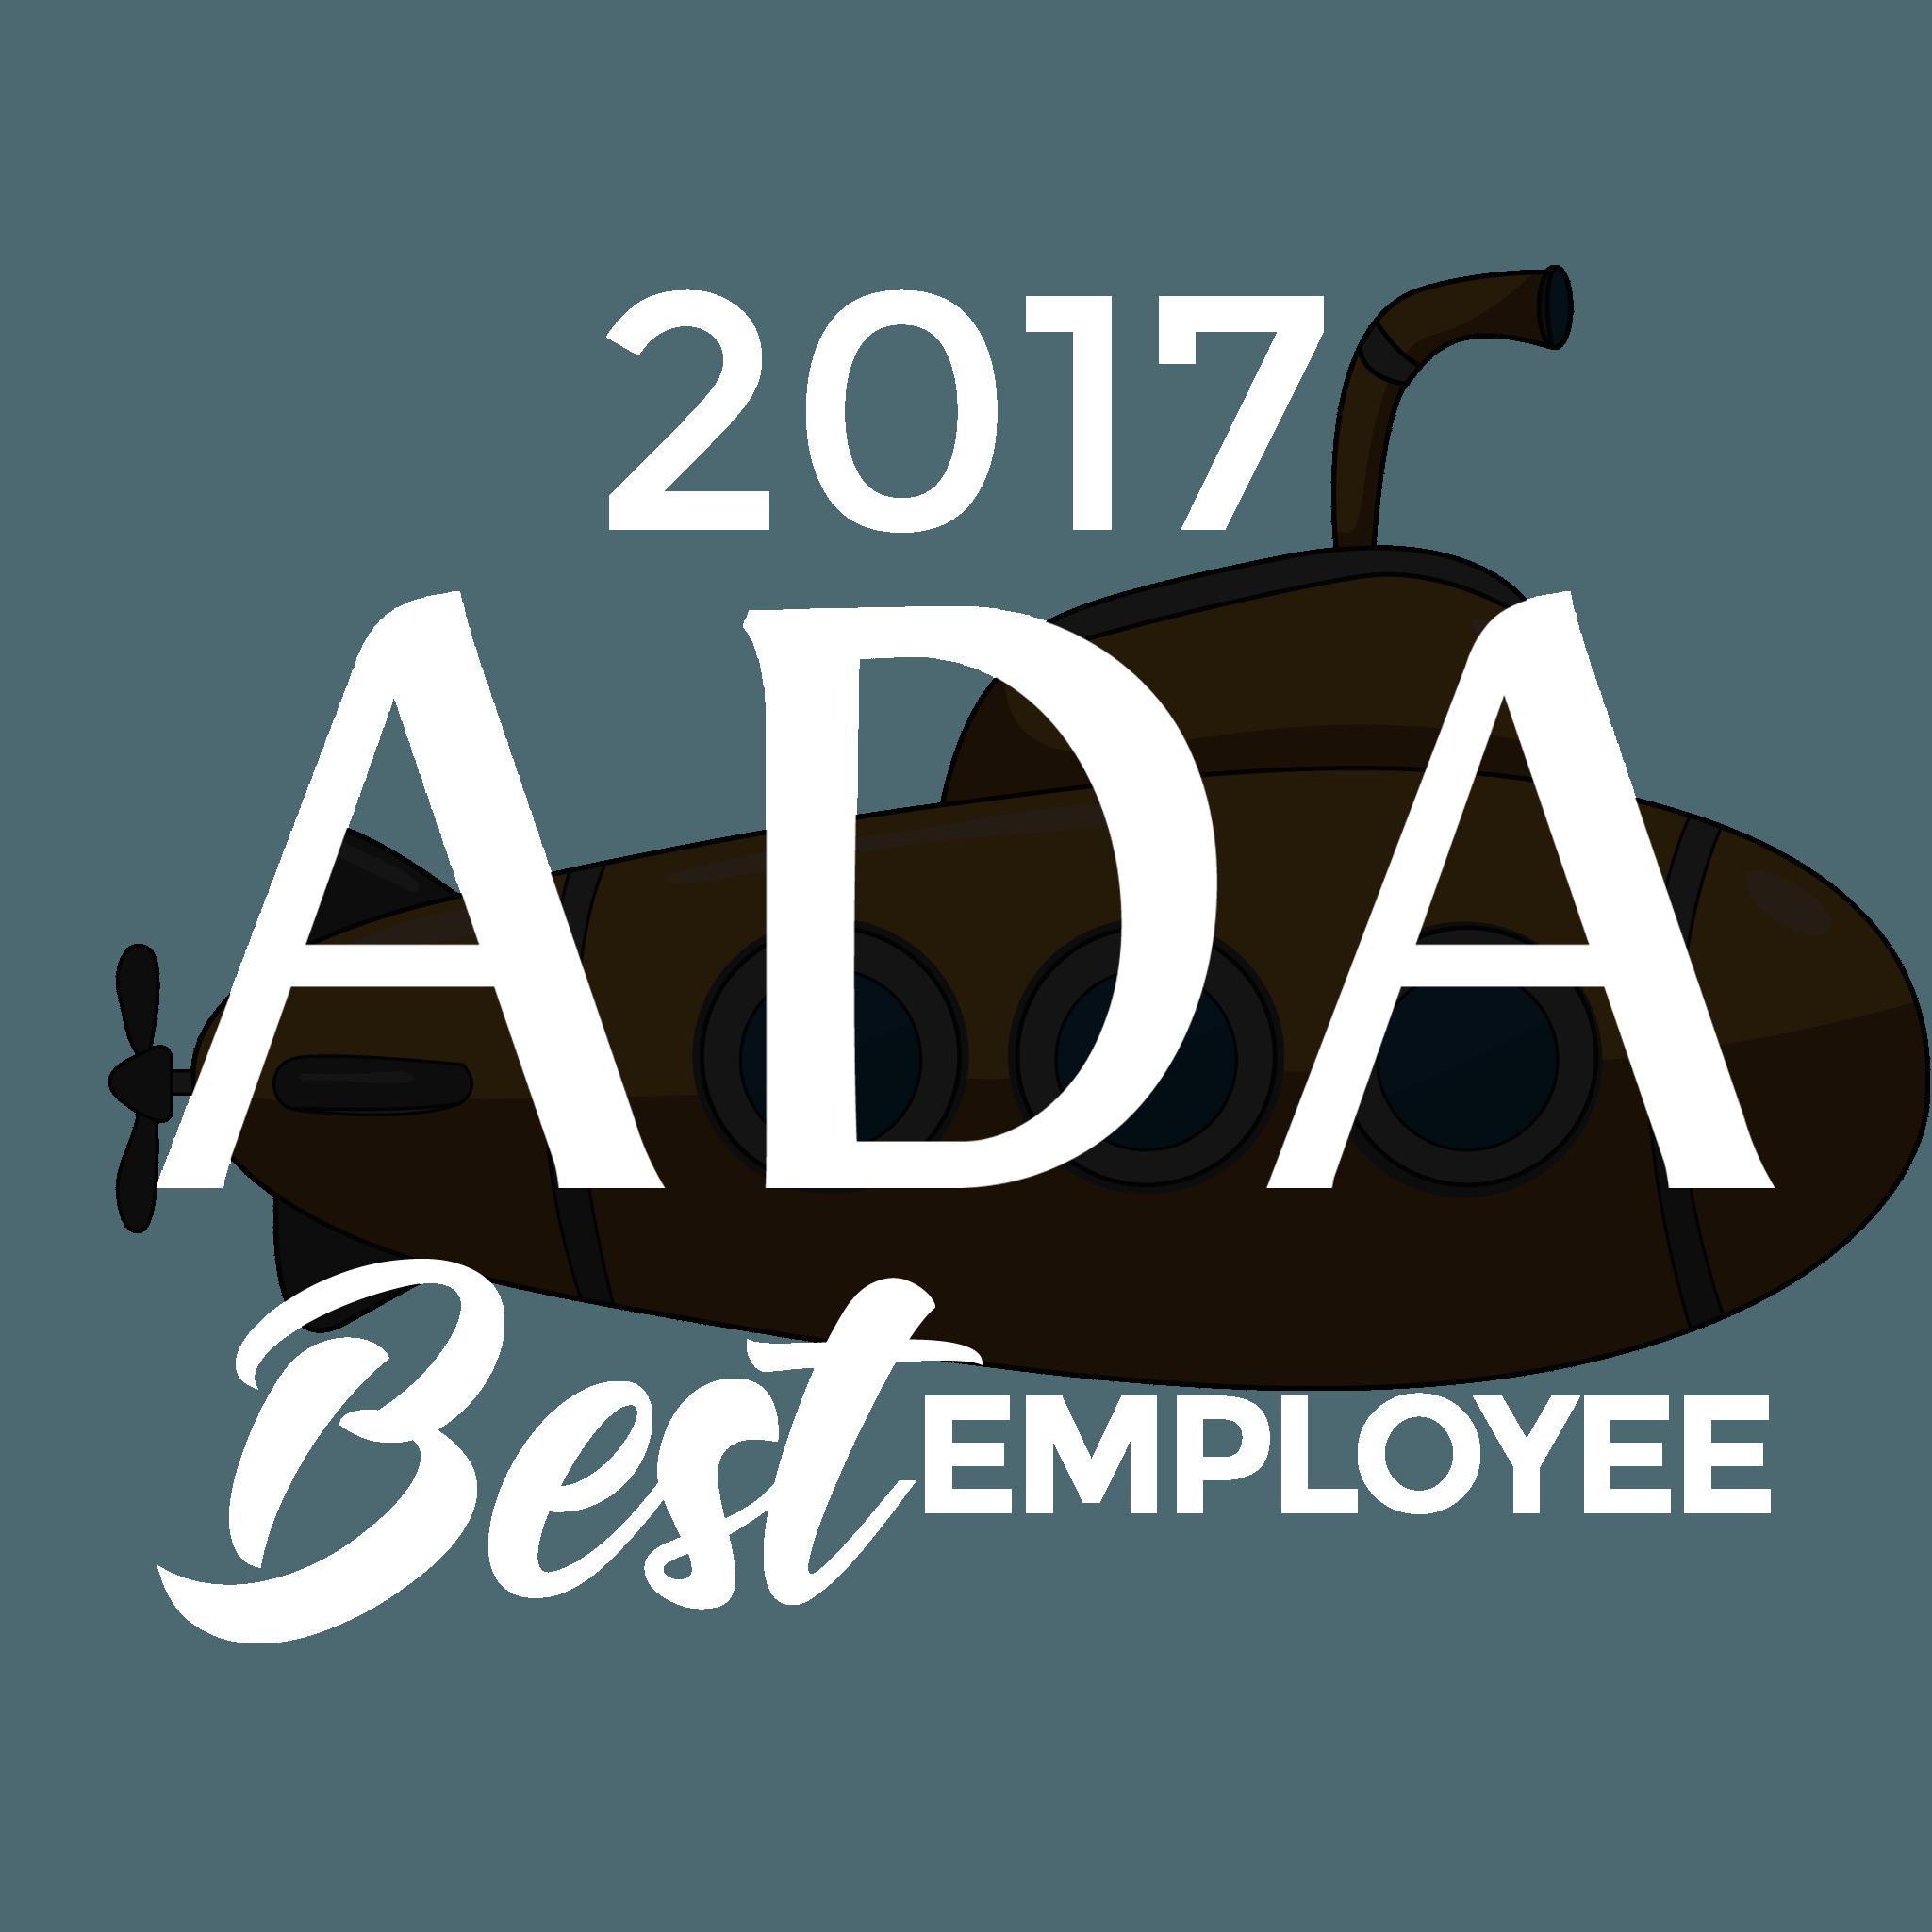 award-best-ADA-Employee-white